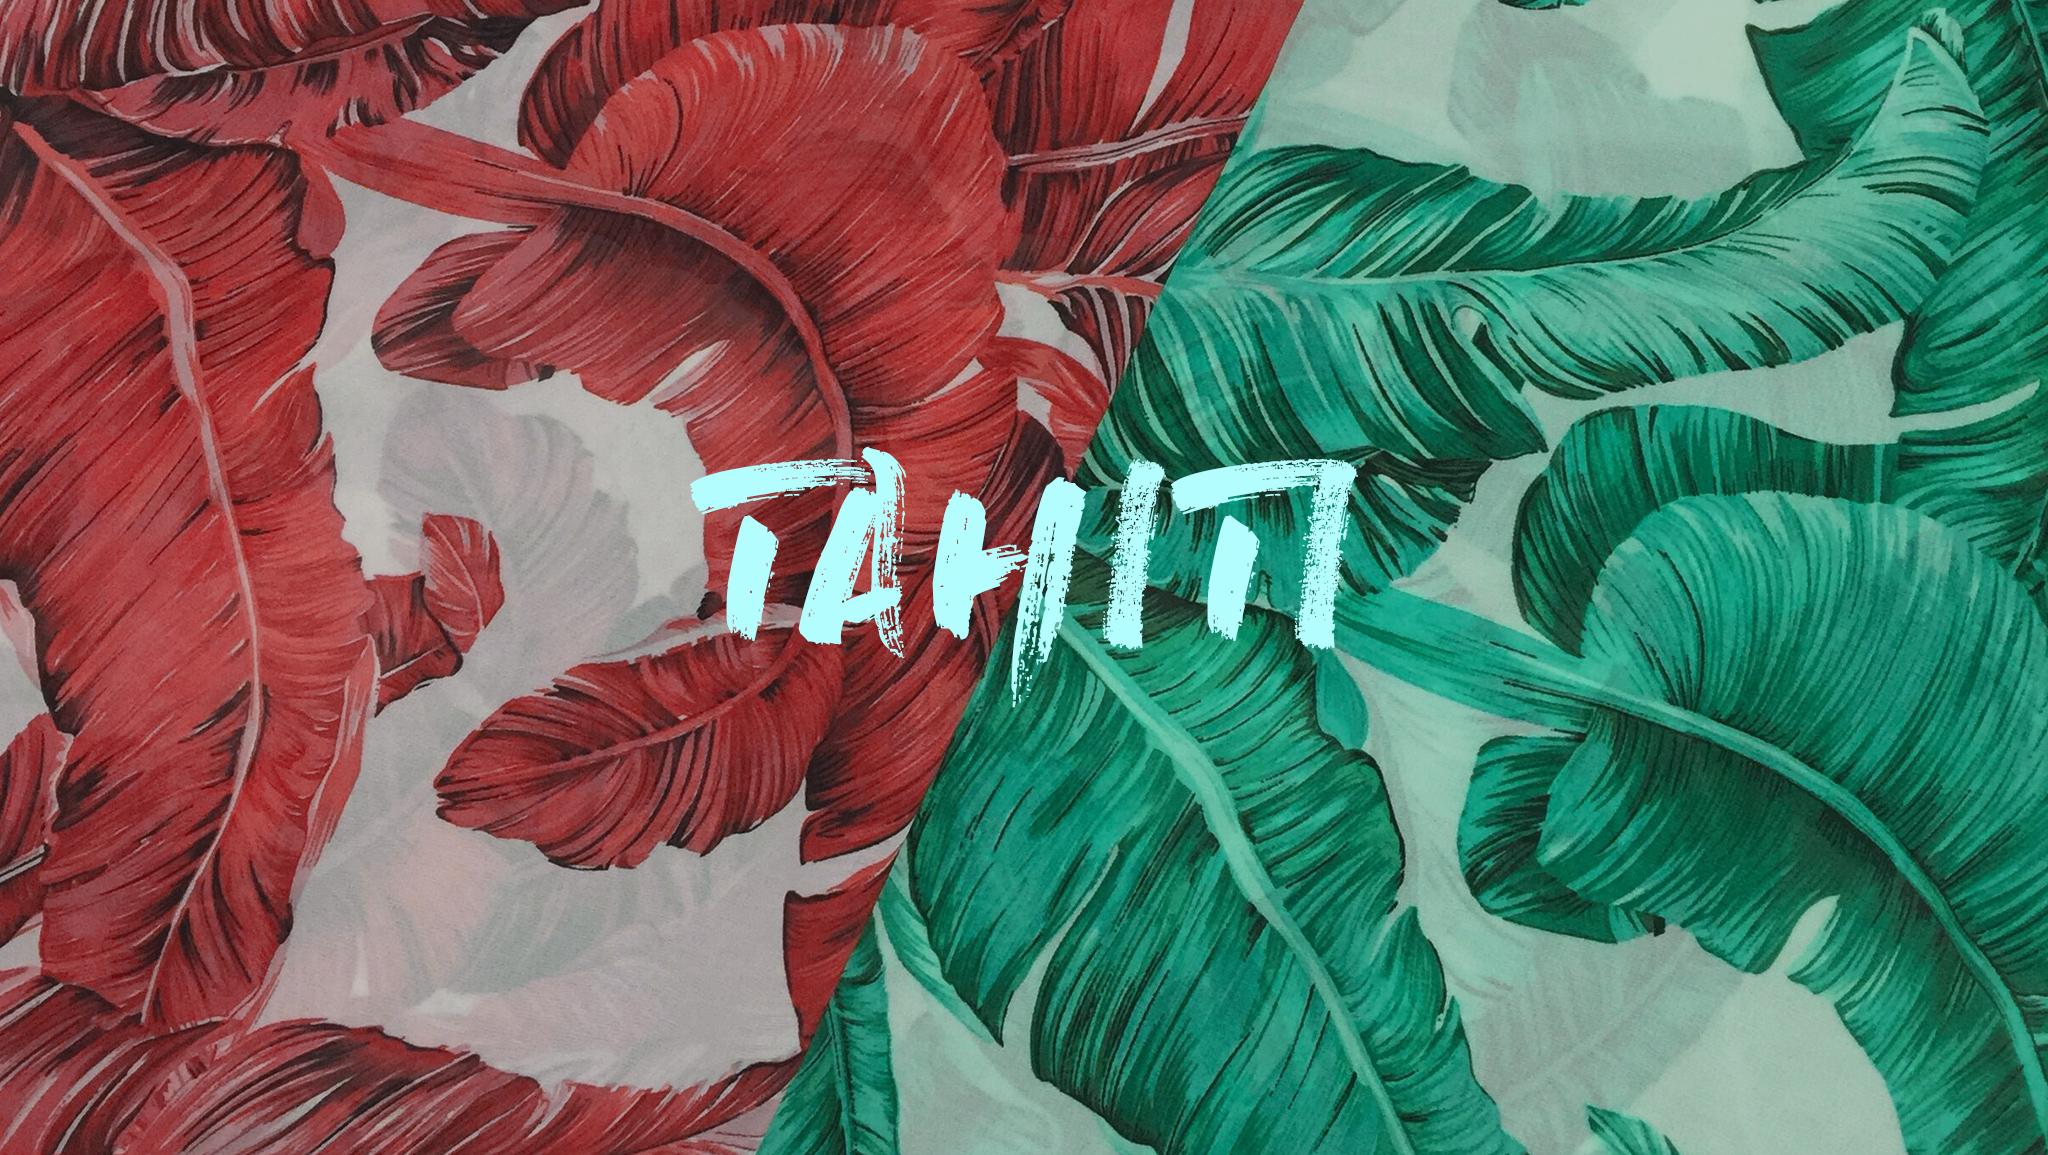 Tahiti Confed Cup